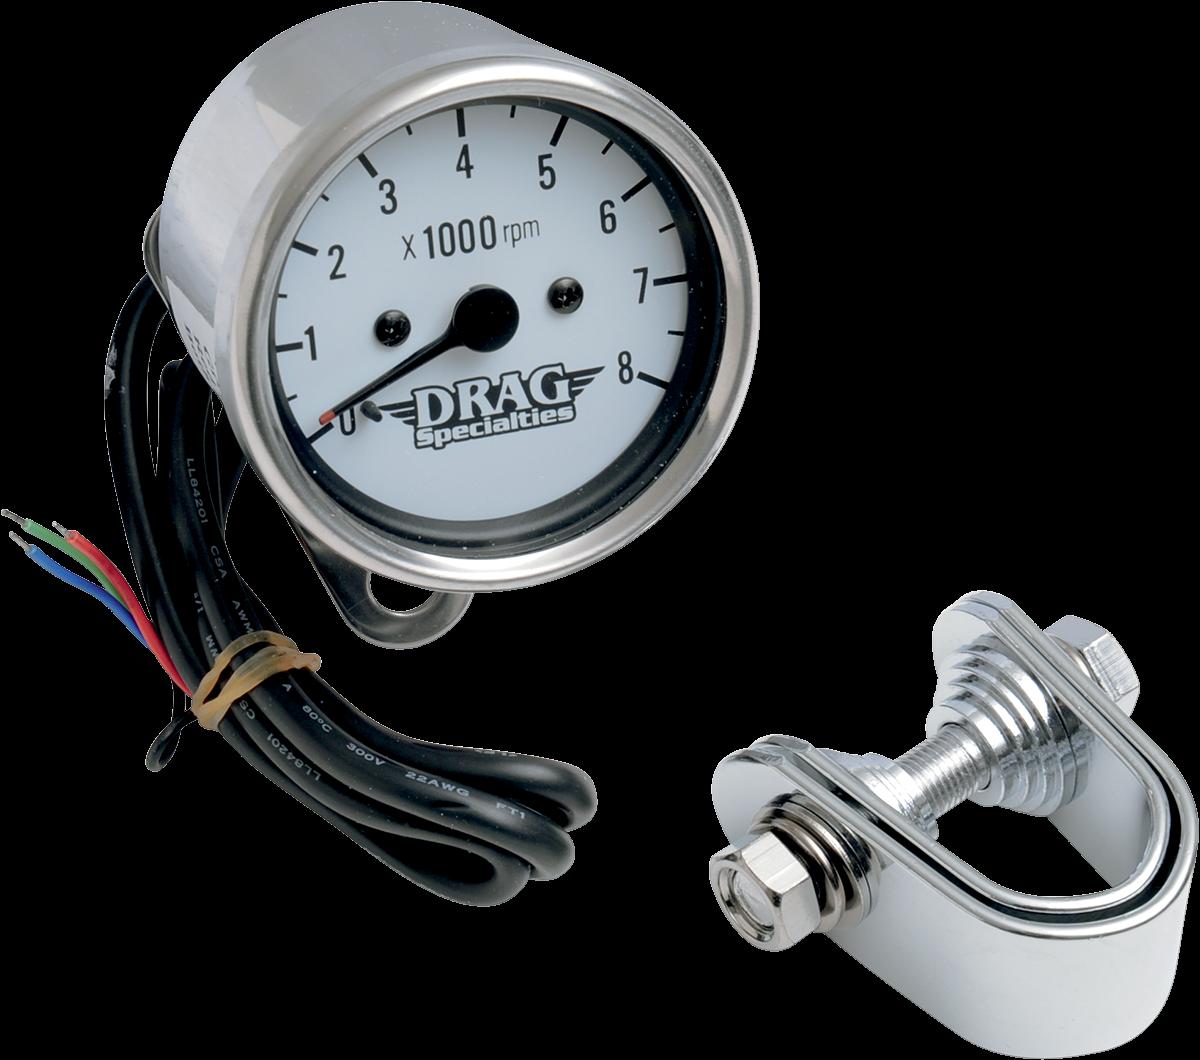 Faze Tach Wiring - Diagrams Catalogue Faze Tachometer Shift Light Wiring Diagram on